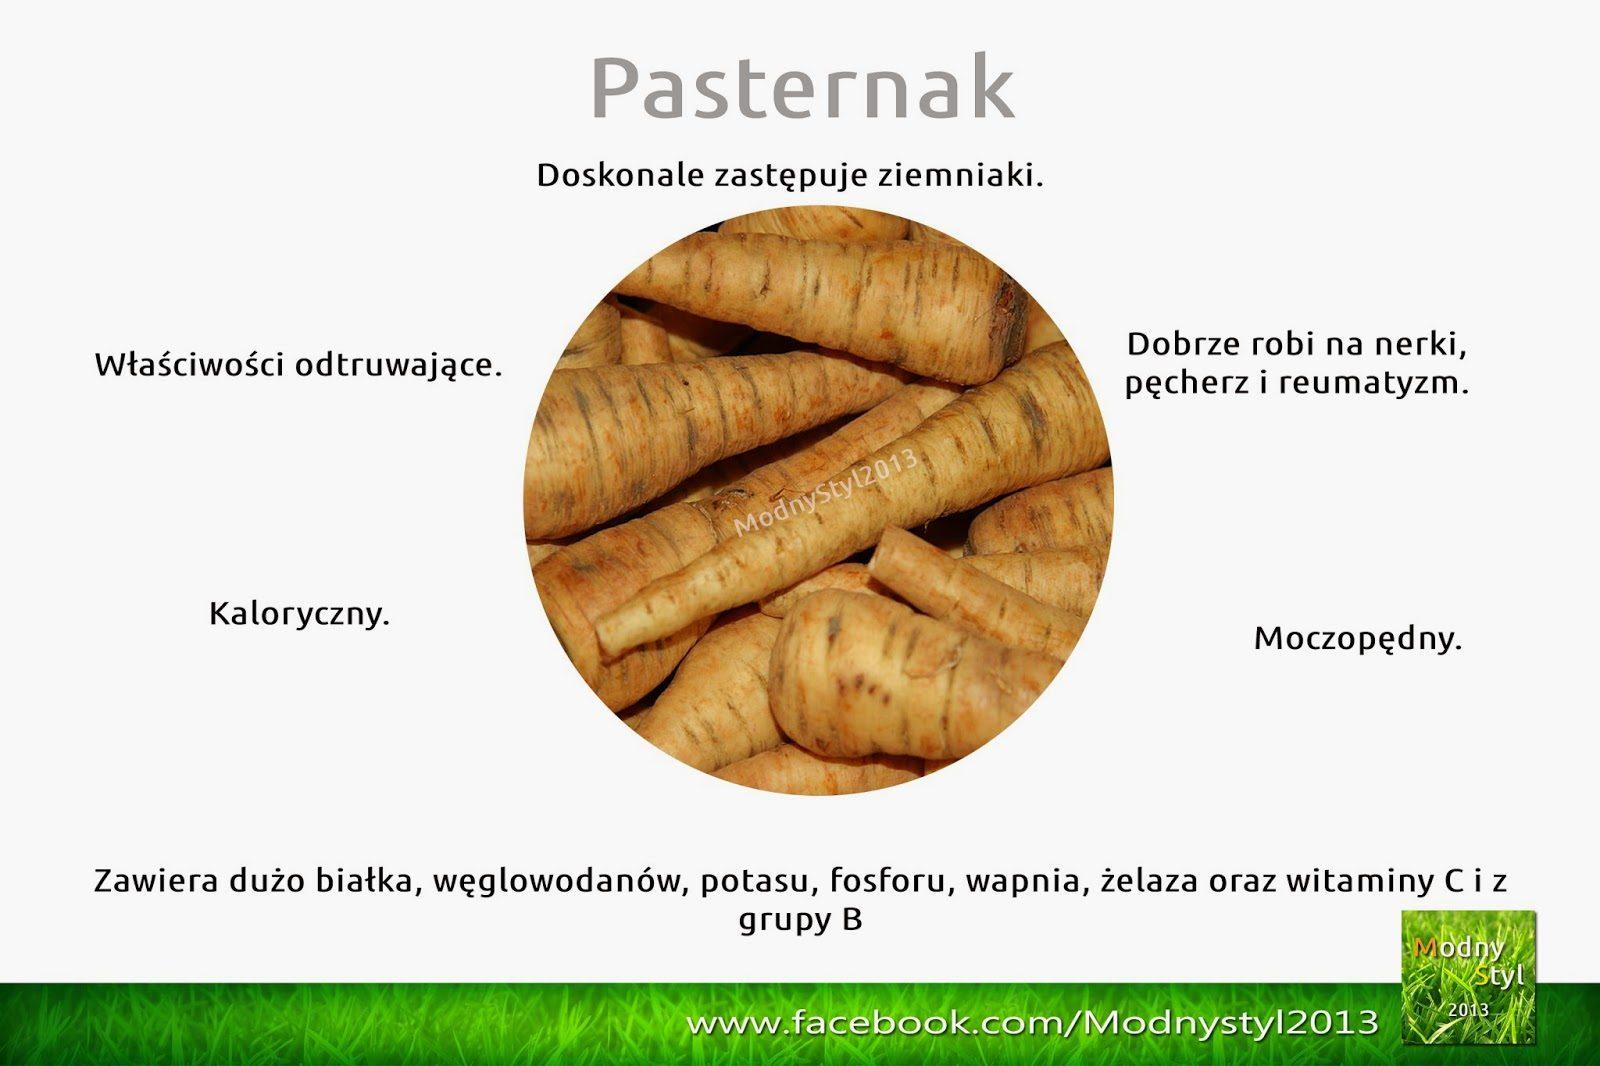 pasternak-2205847